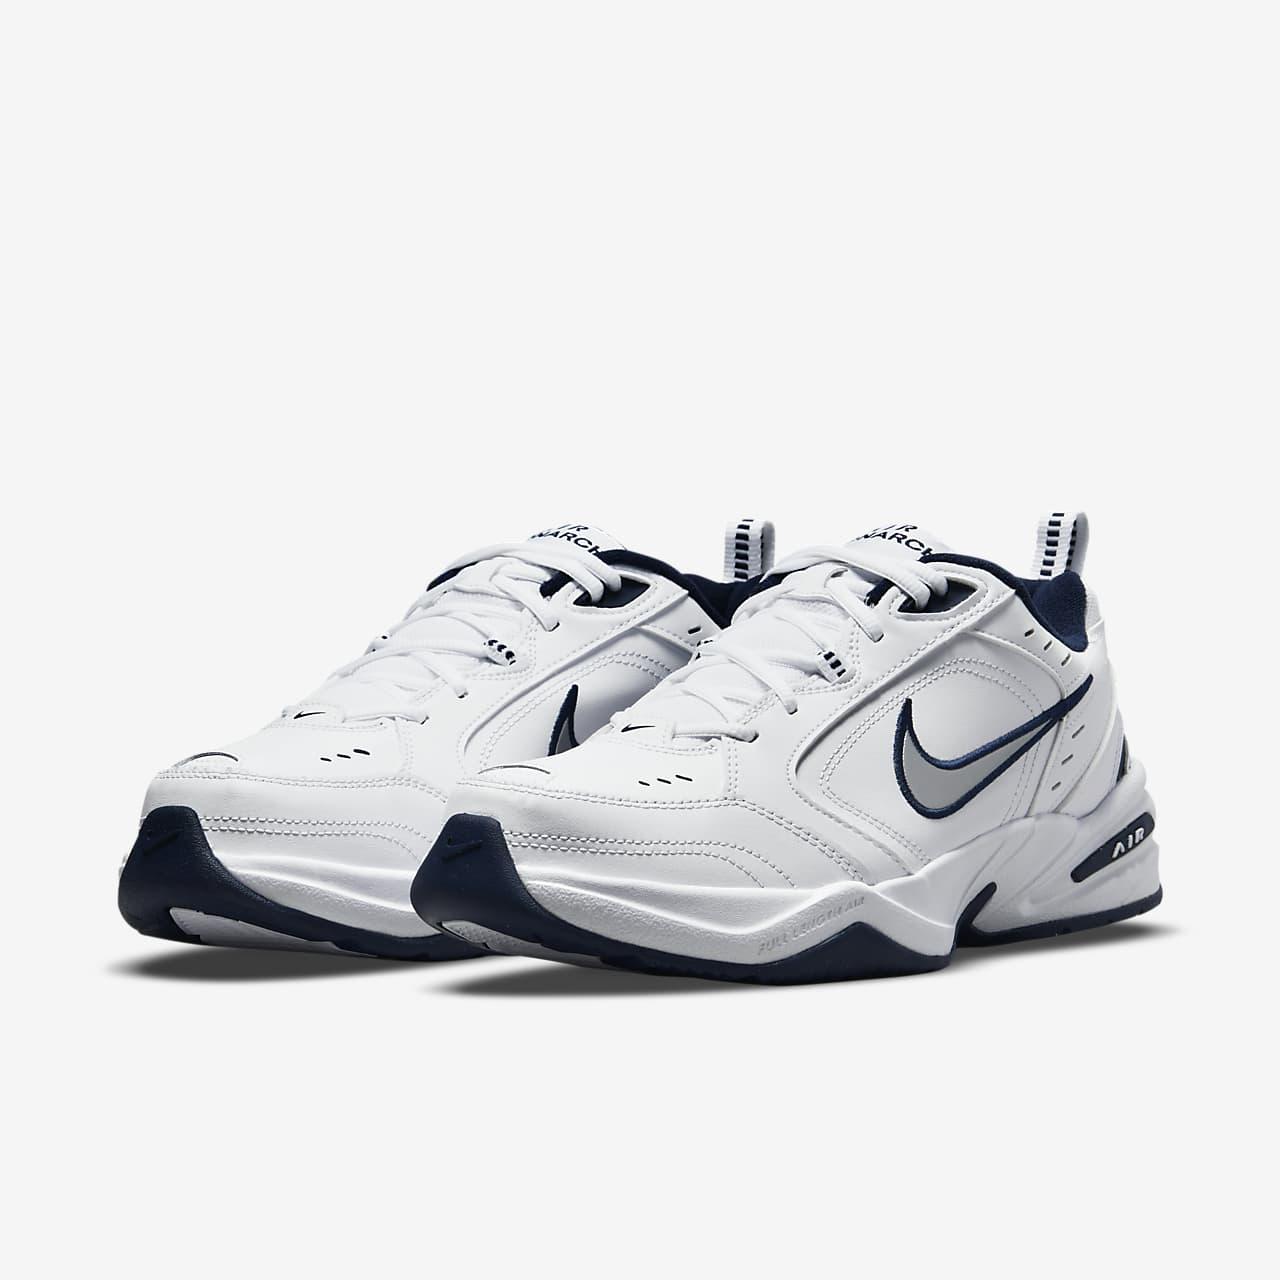 nike air monarch iv sneakers